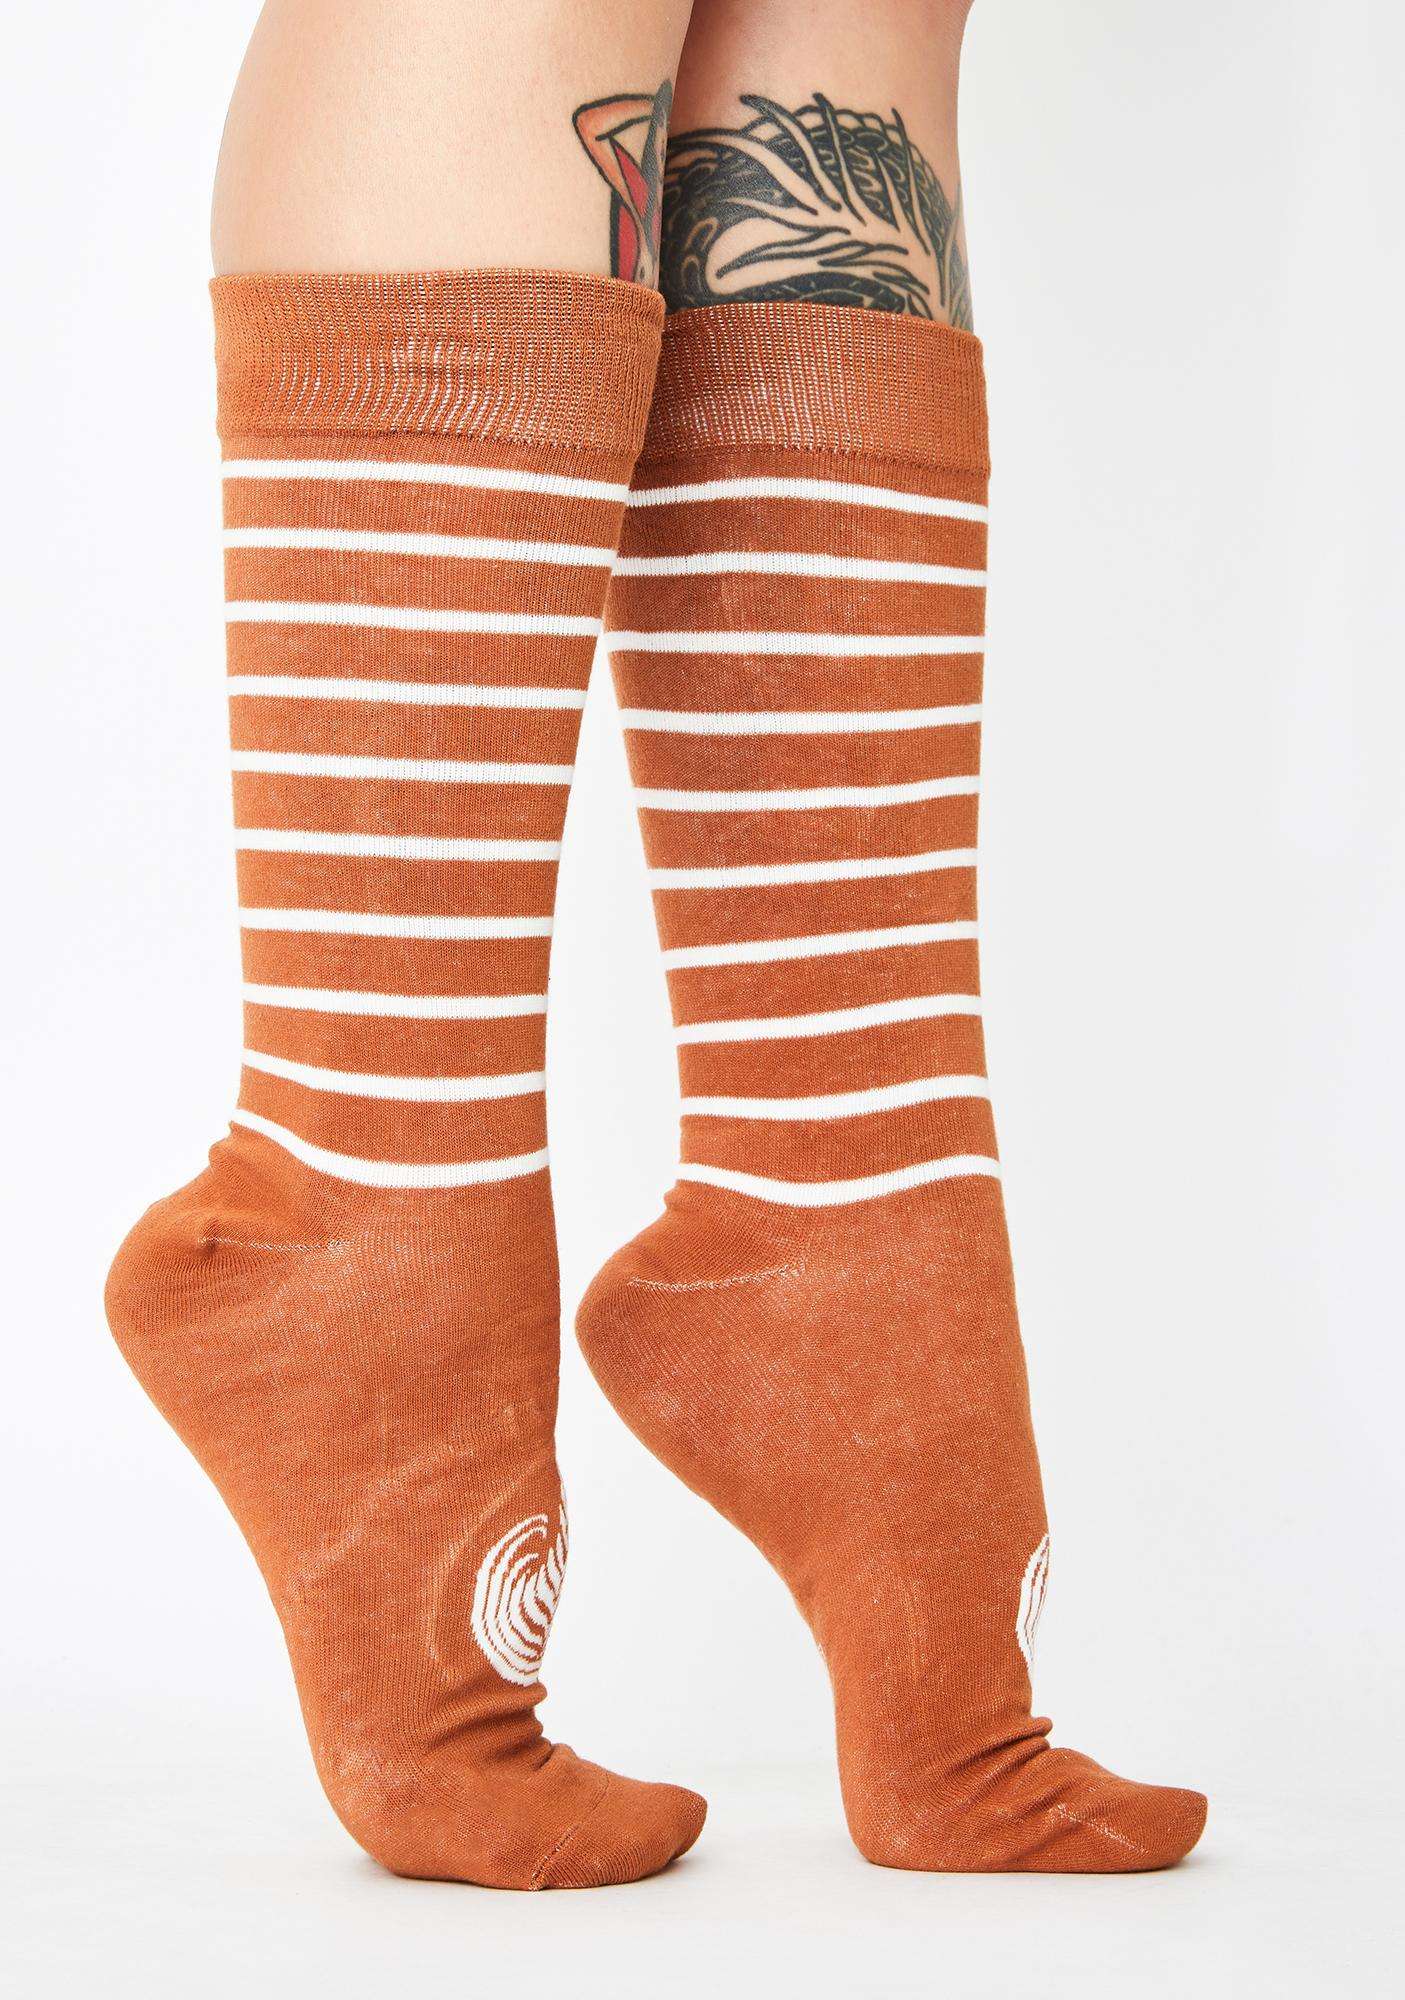 Just One Sip Crew Socks